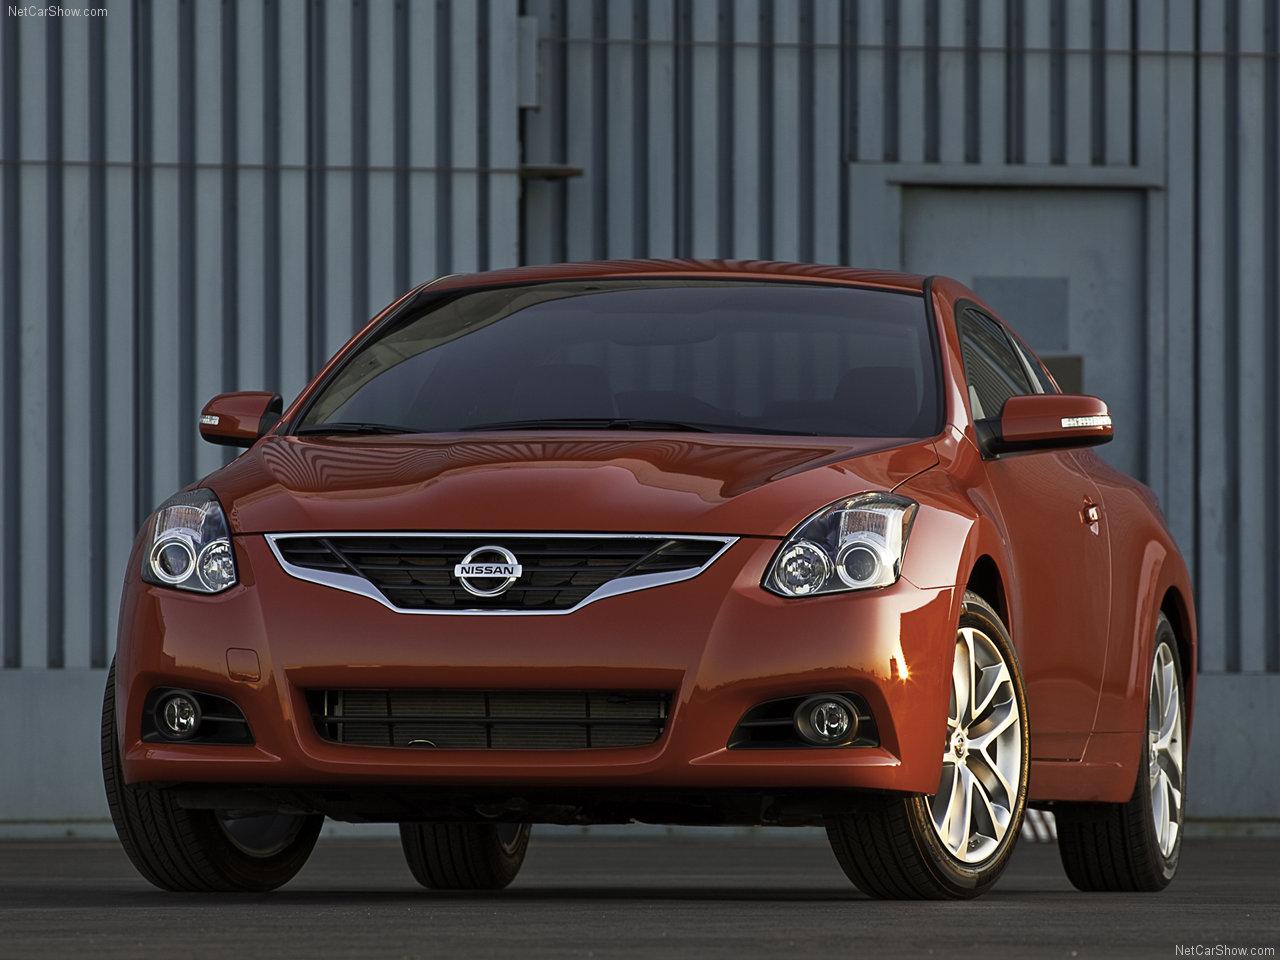 http://3.bp.blogspot.com/_Uo4WUJnySi8/S9HMIZnS_MI/AAAAAAAAACg/5d_iAOYmE28/s1600/Nissan-Altima_Coupe_2010_1280x960_wallpaper_01.jpg